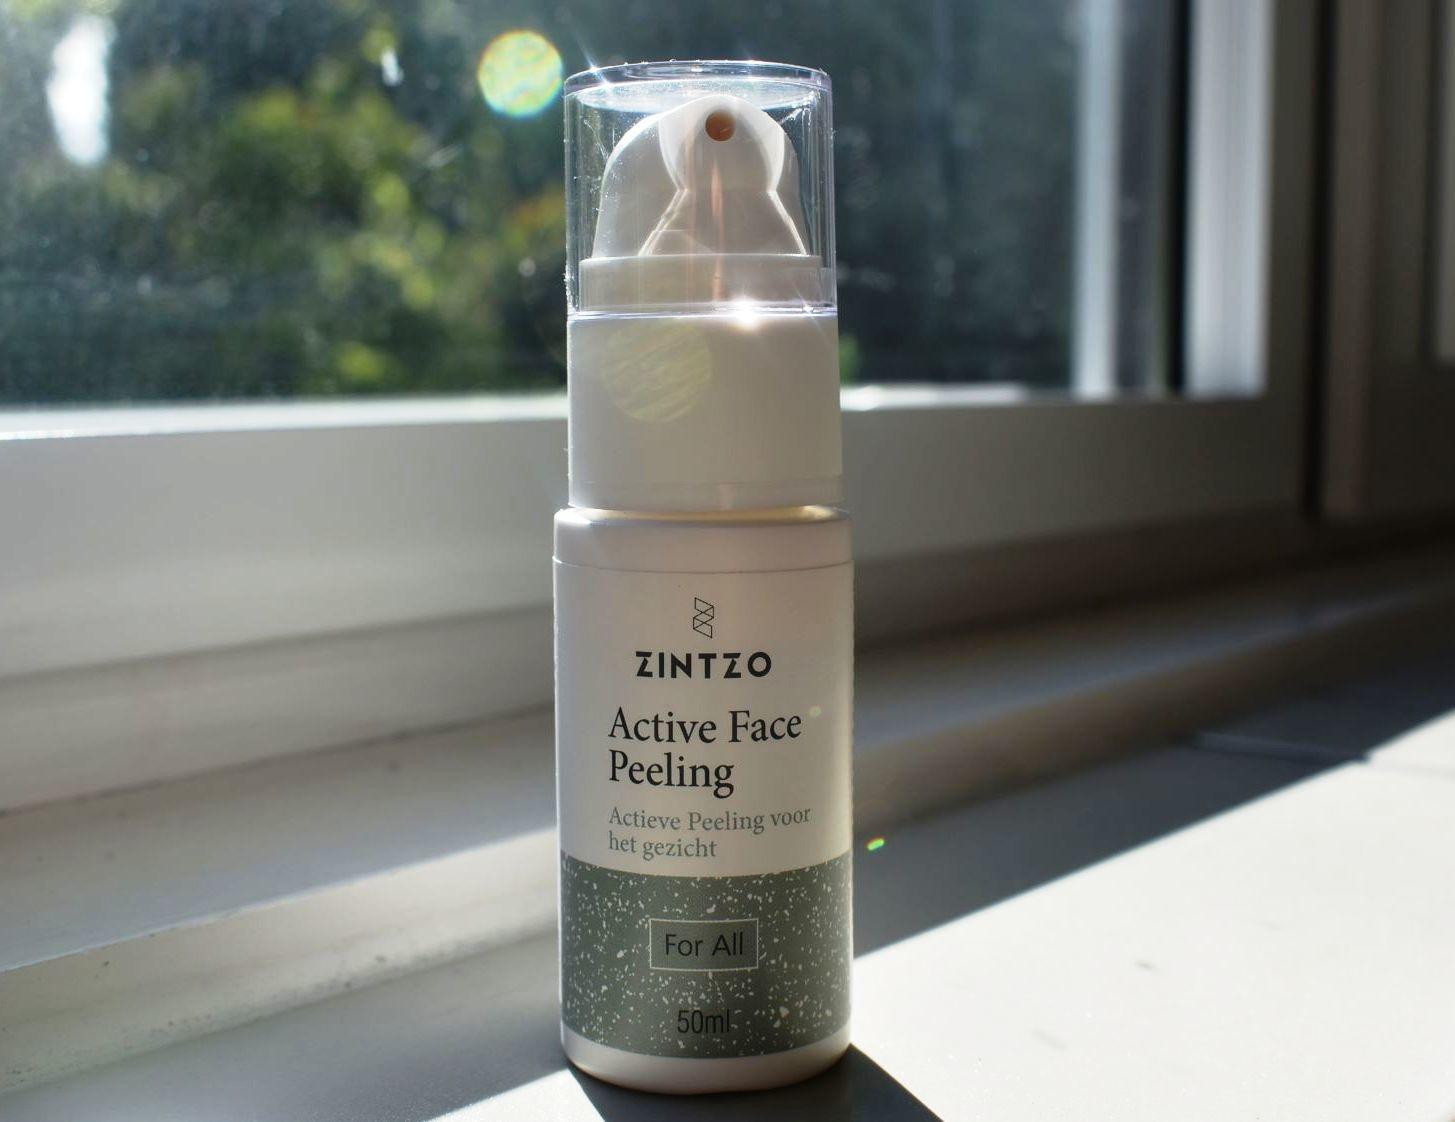 Review: Zintzo Active Face Peeling